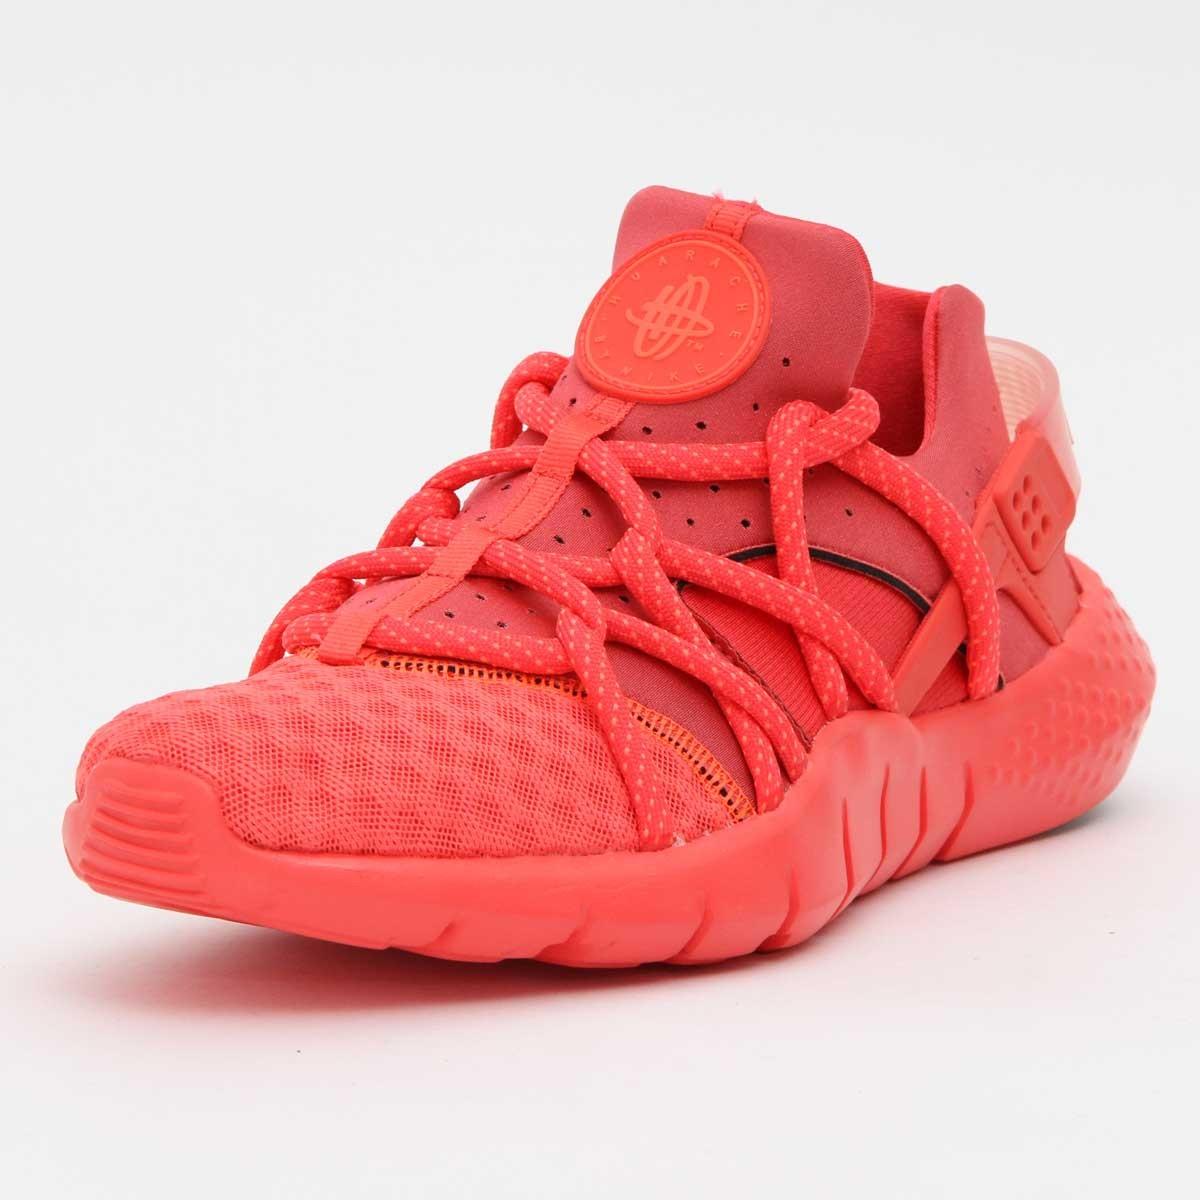 15bbba0801c3 Nike Huarache NM Rio Hot Lava 705159-601